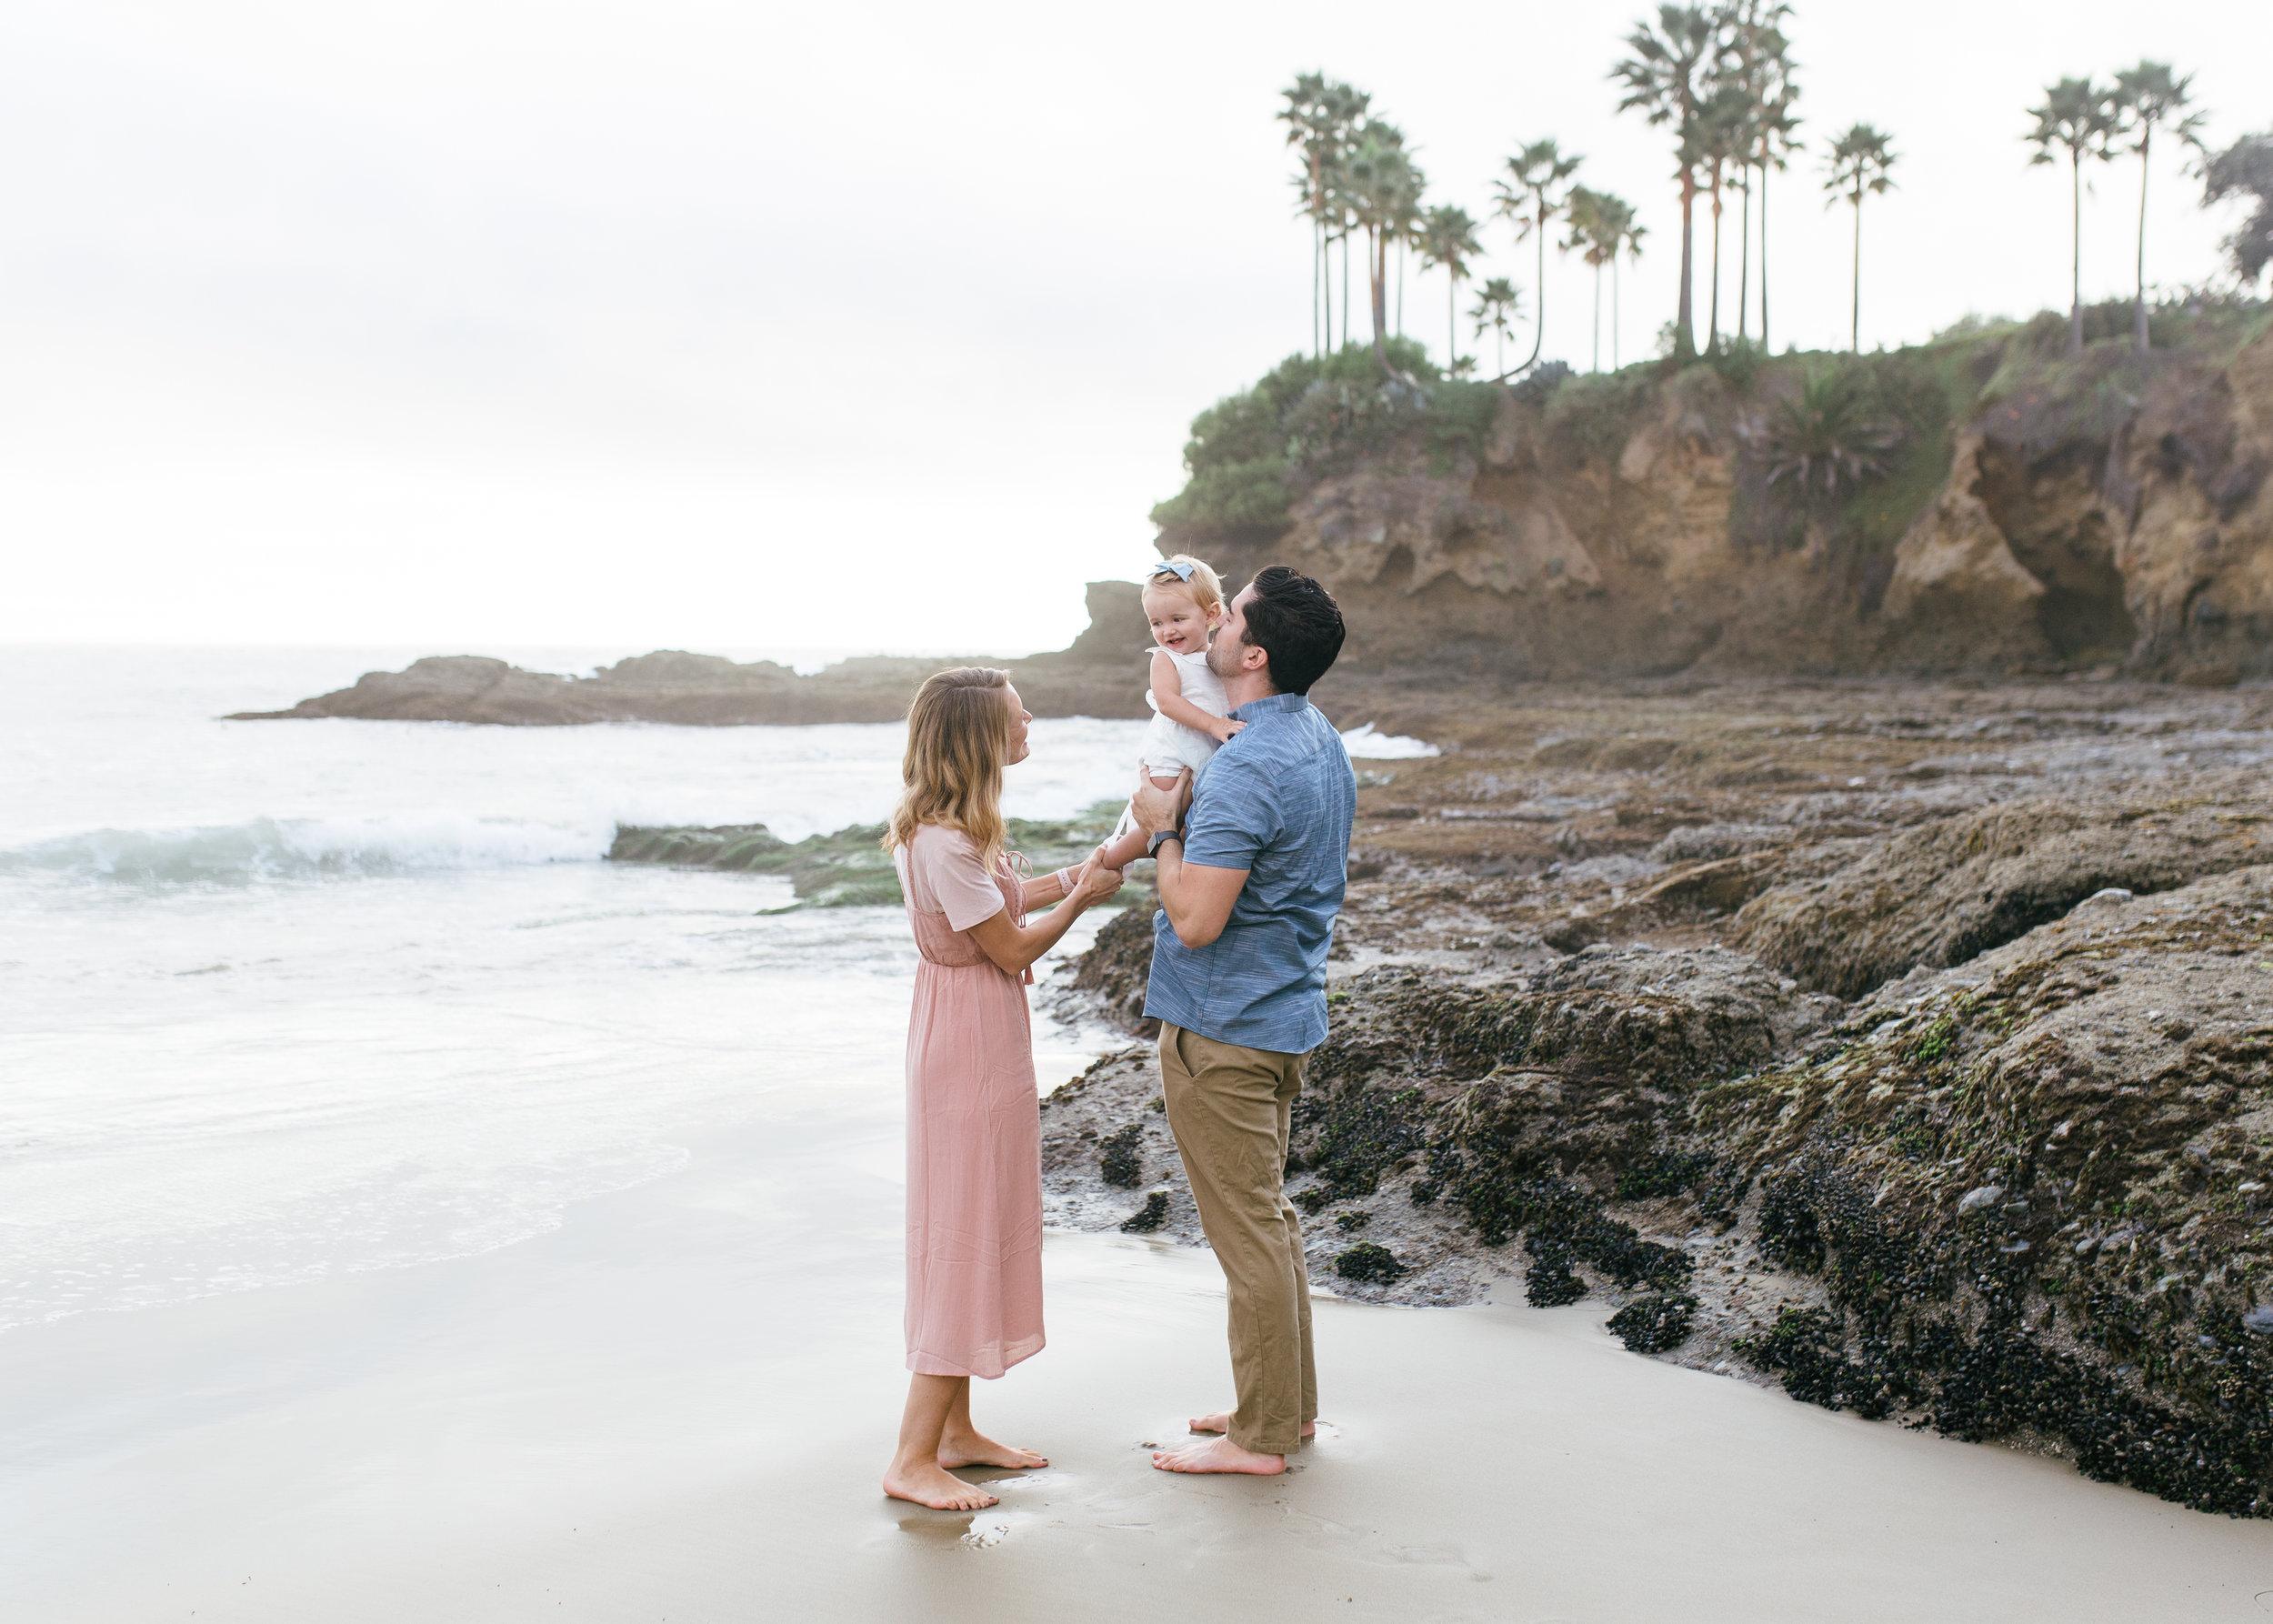 laguna beach california family photography session